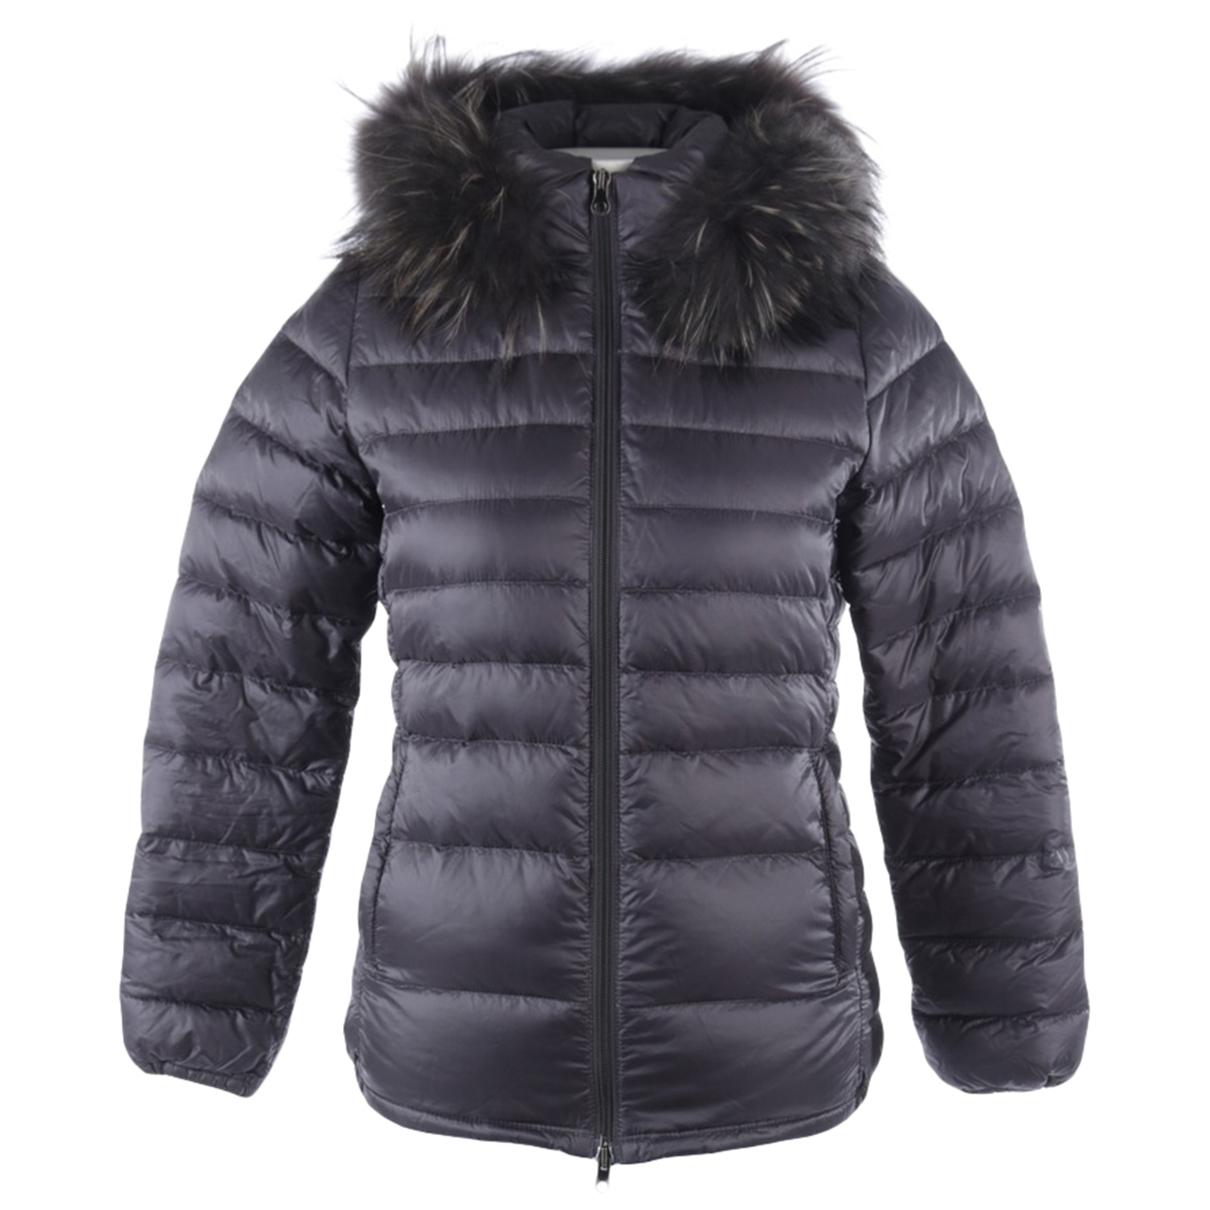 Duvetica \N Grey jacket for Women 38 FR